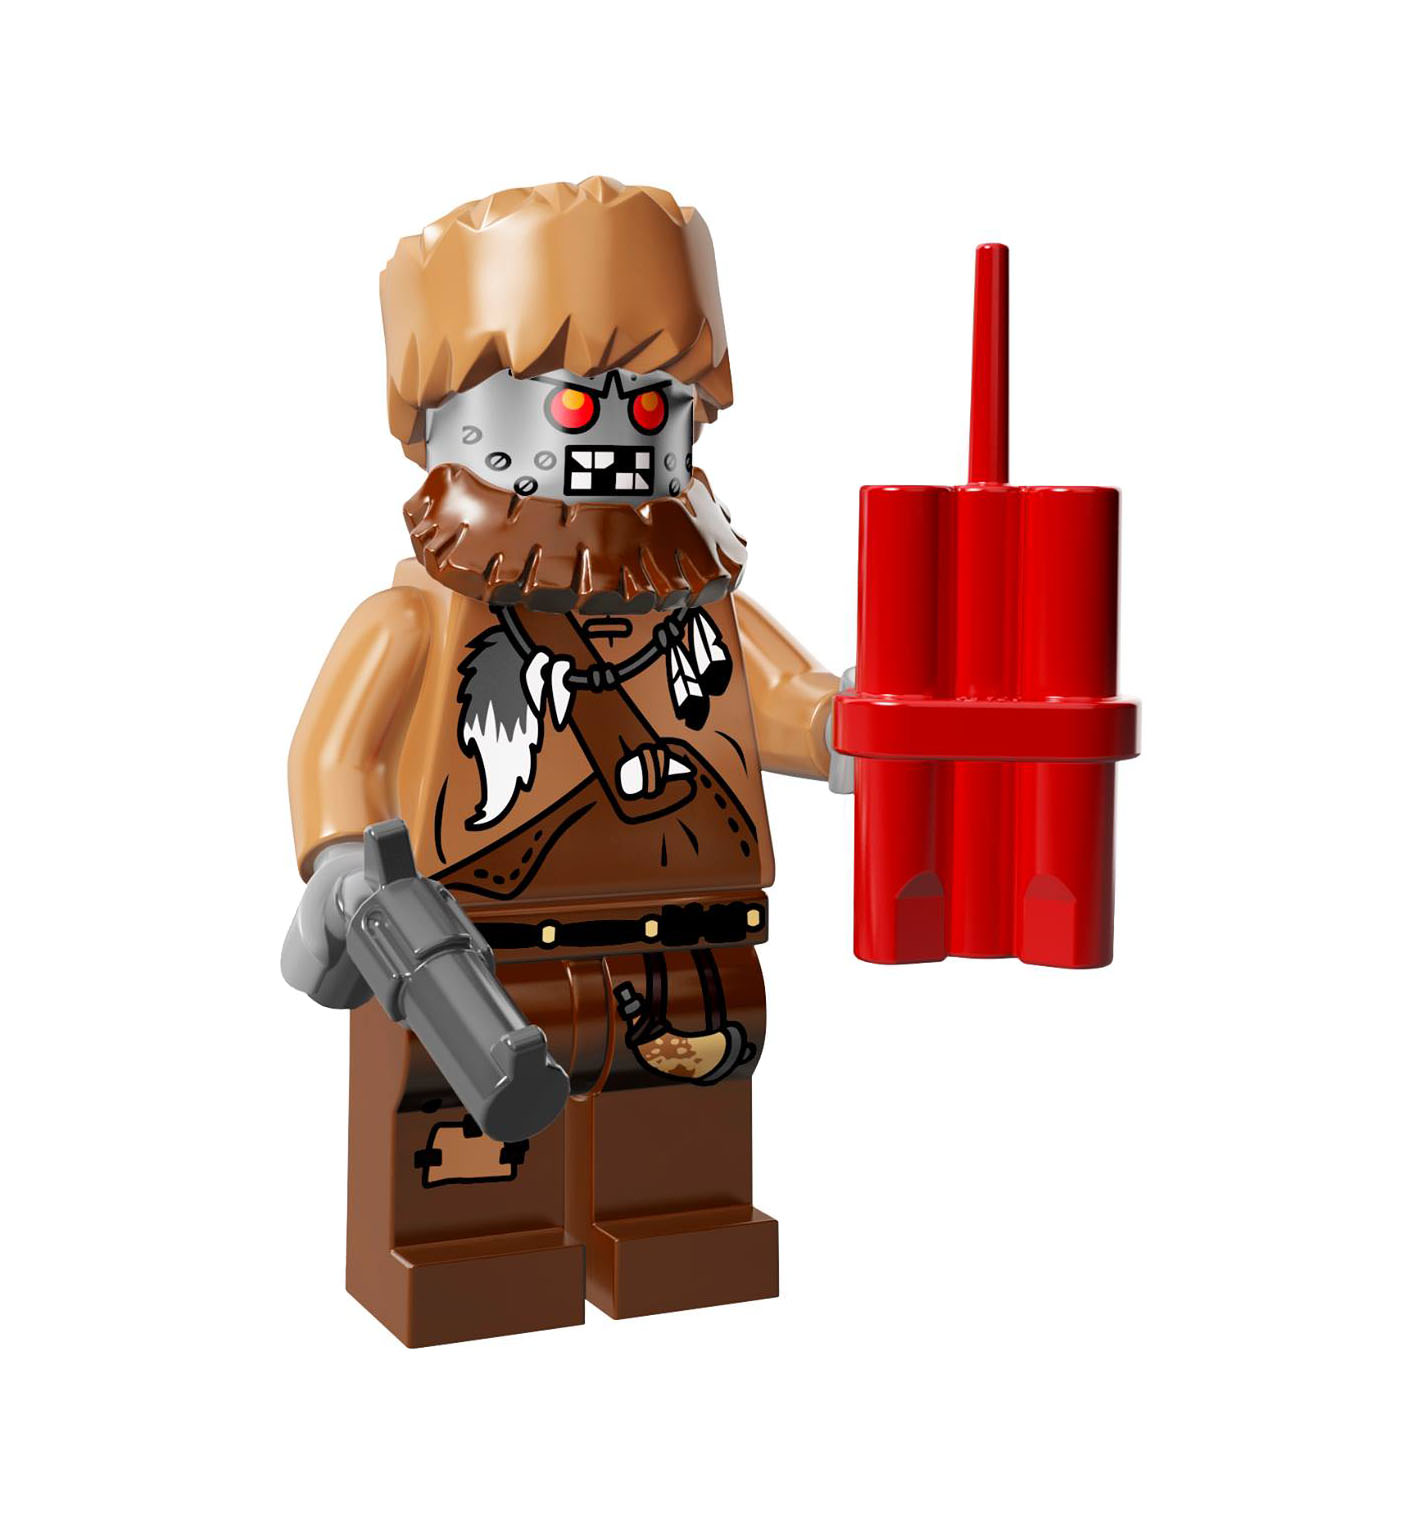 71004 The Lego Movie Series Brickipedia Fandom